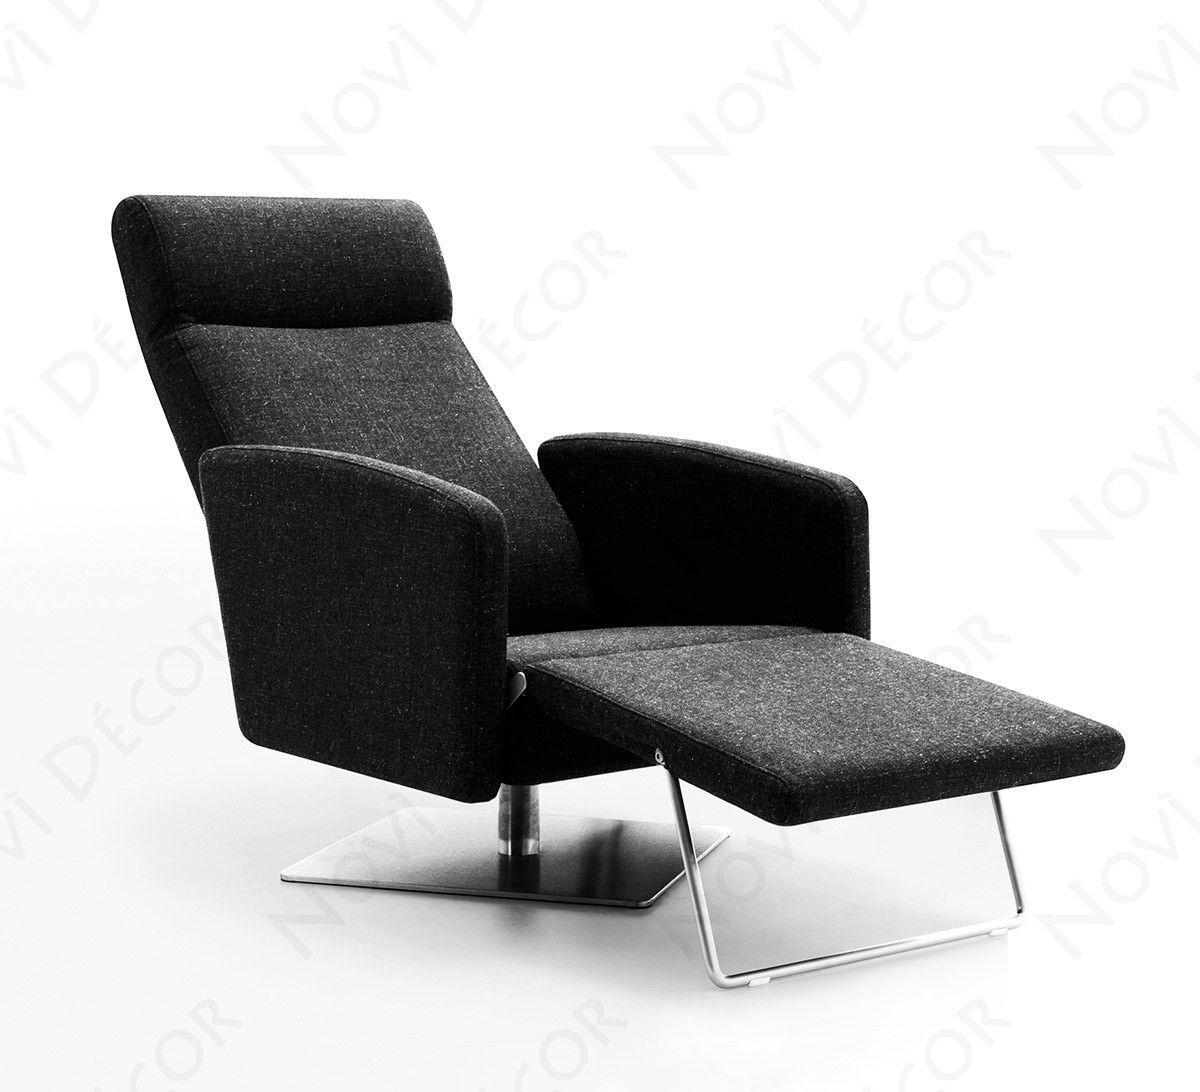 Superb Modern Reclining Chair And Modern Recliner | Modern Recliners | Pinterest |  Recliner, Modern And Reclining Sofa